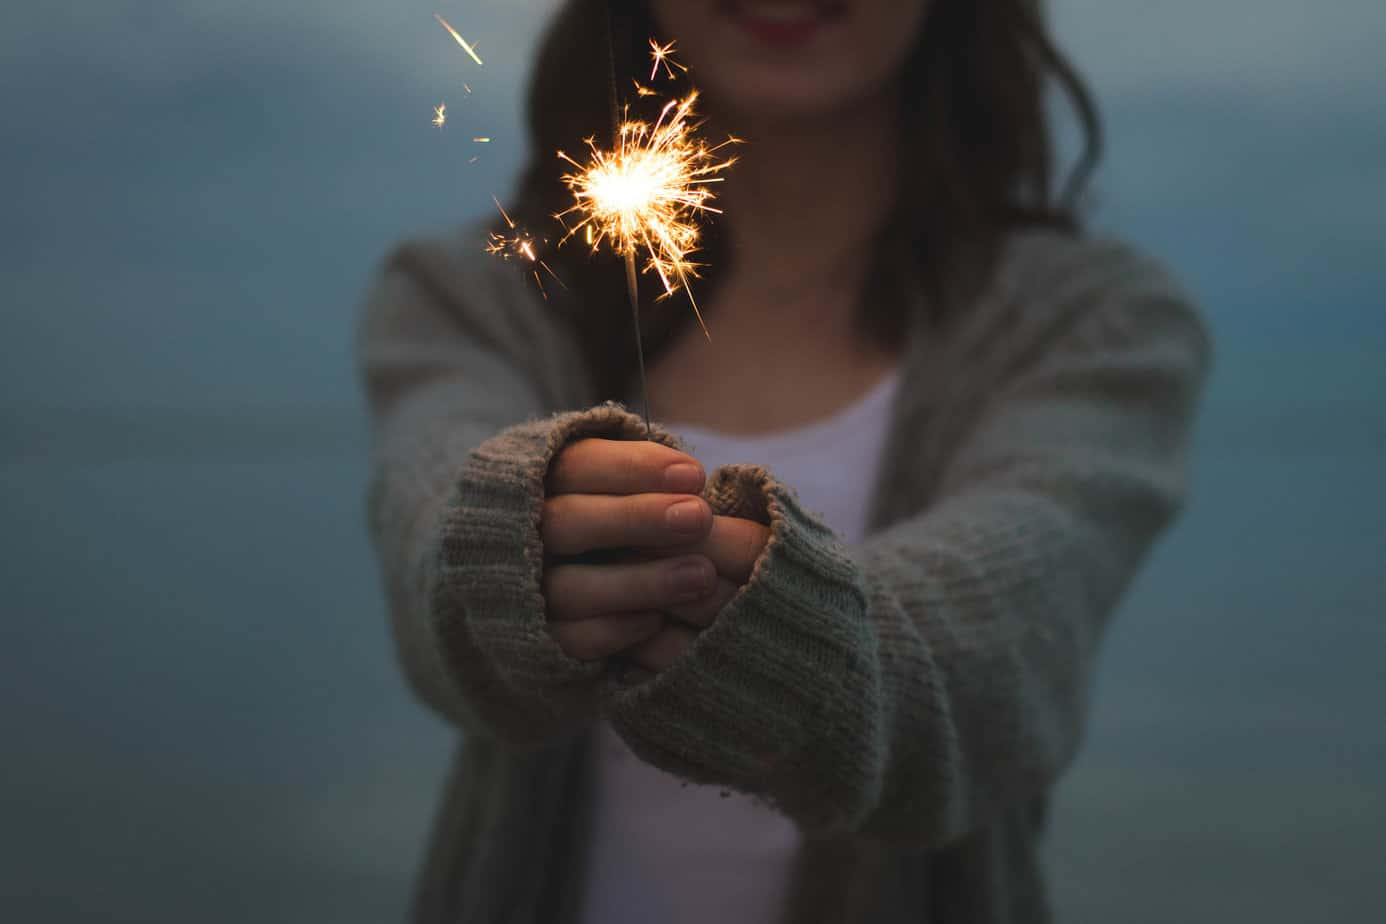 10 Fearless Ways to Live an Inspiring Life